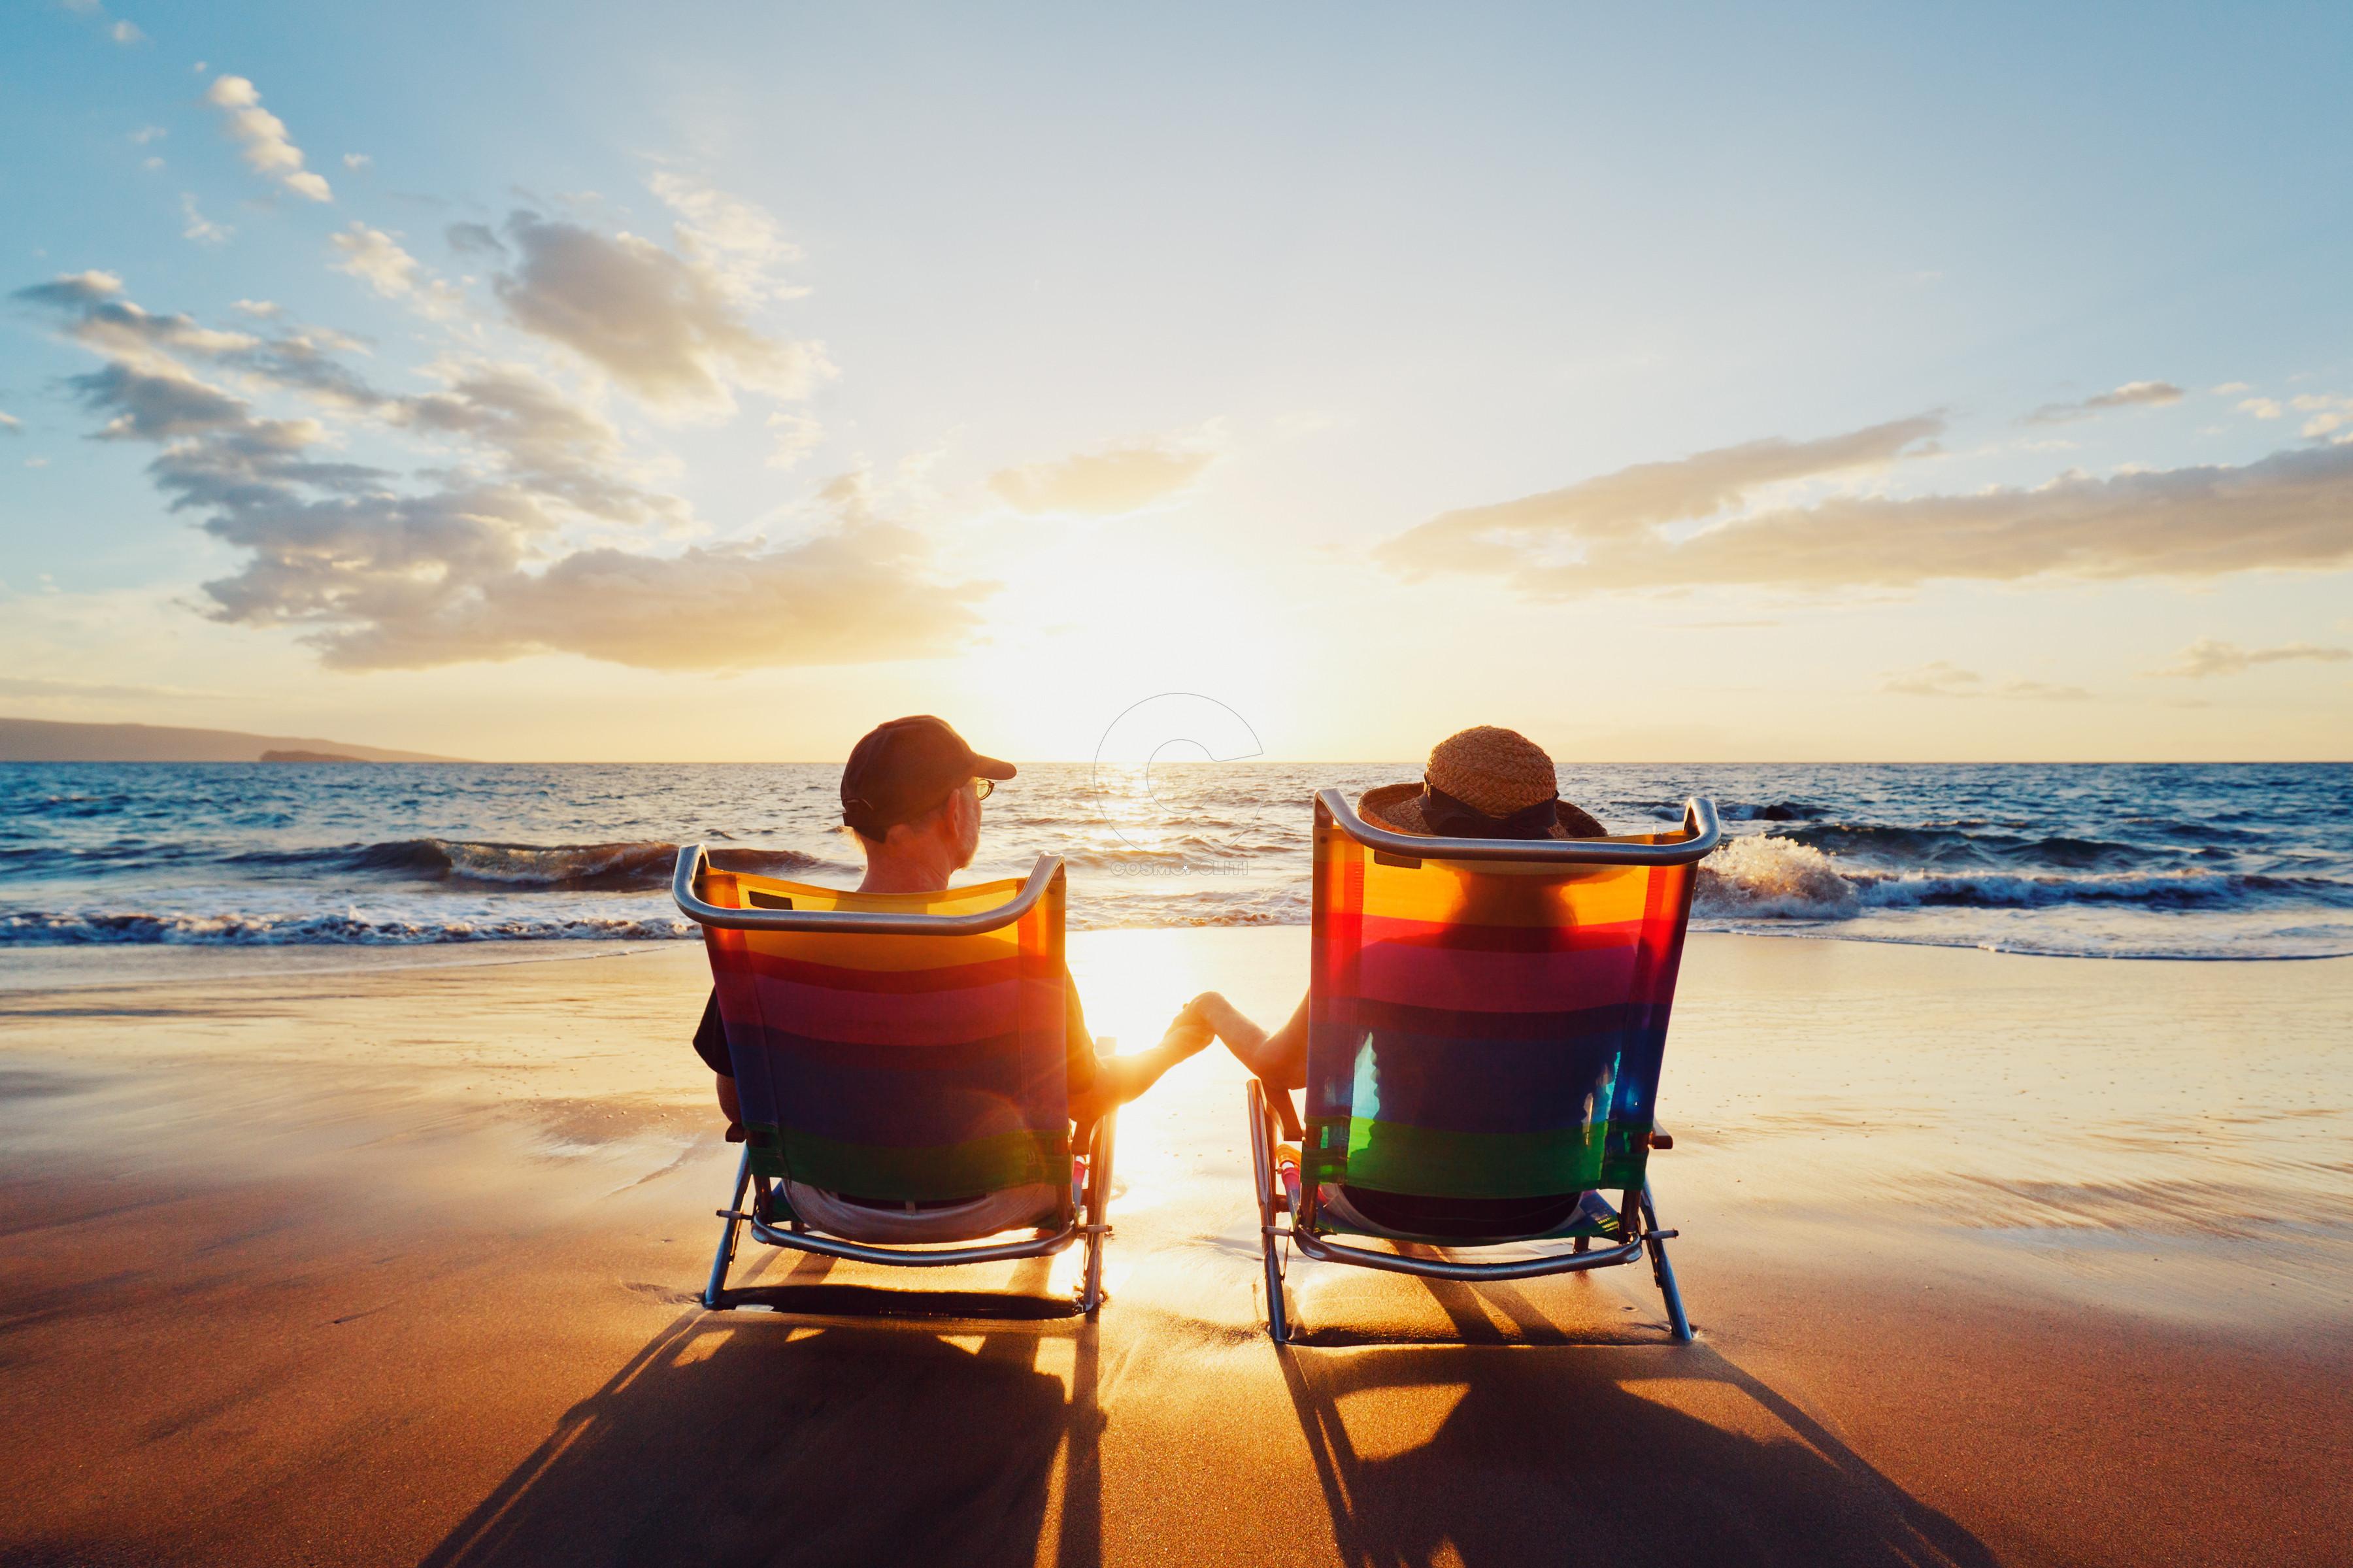 beach-older-couple-big